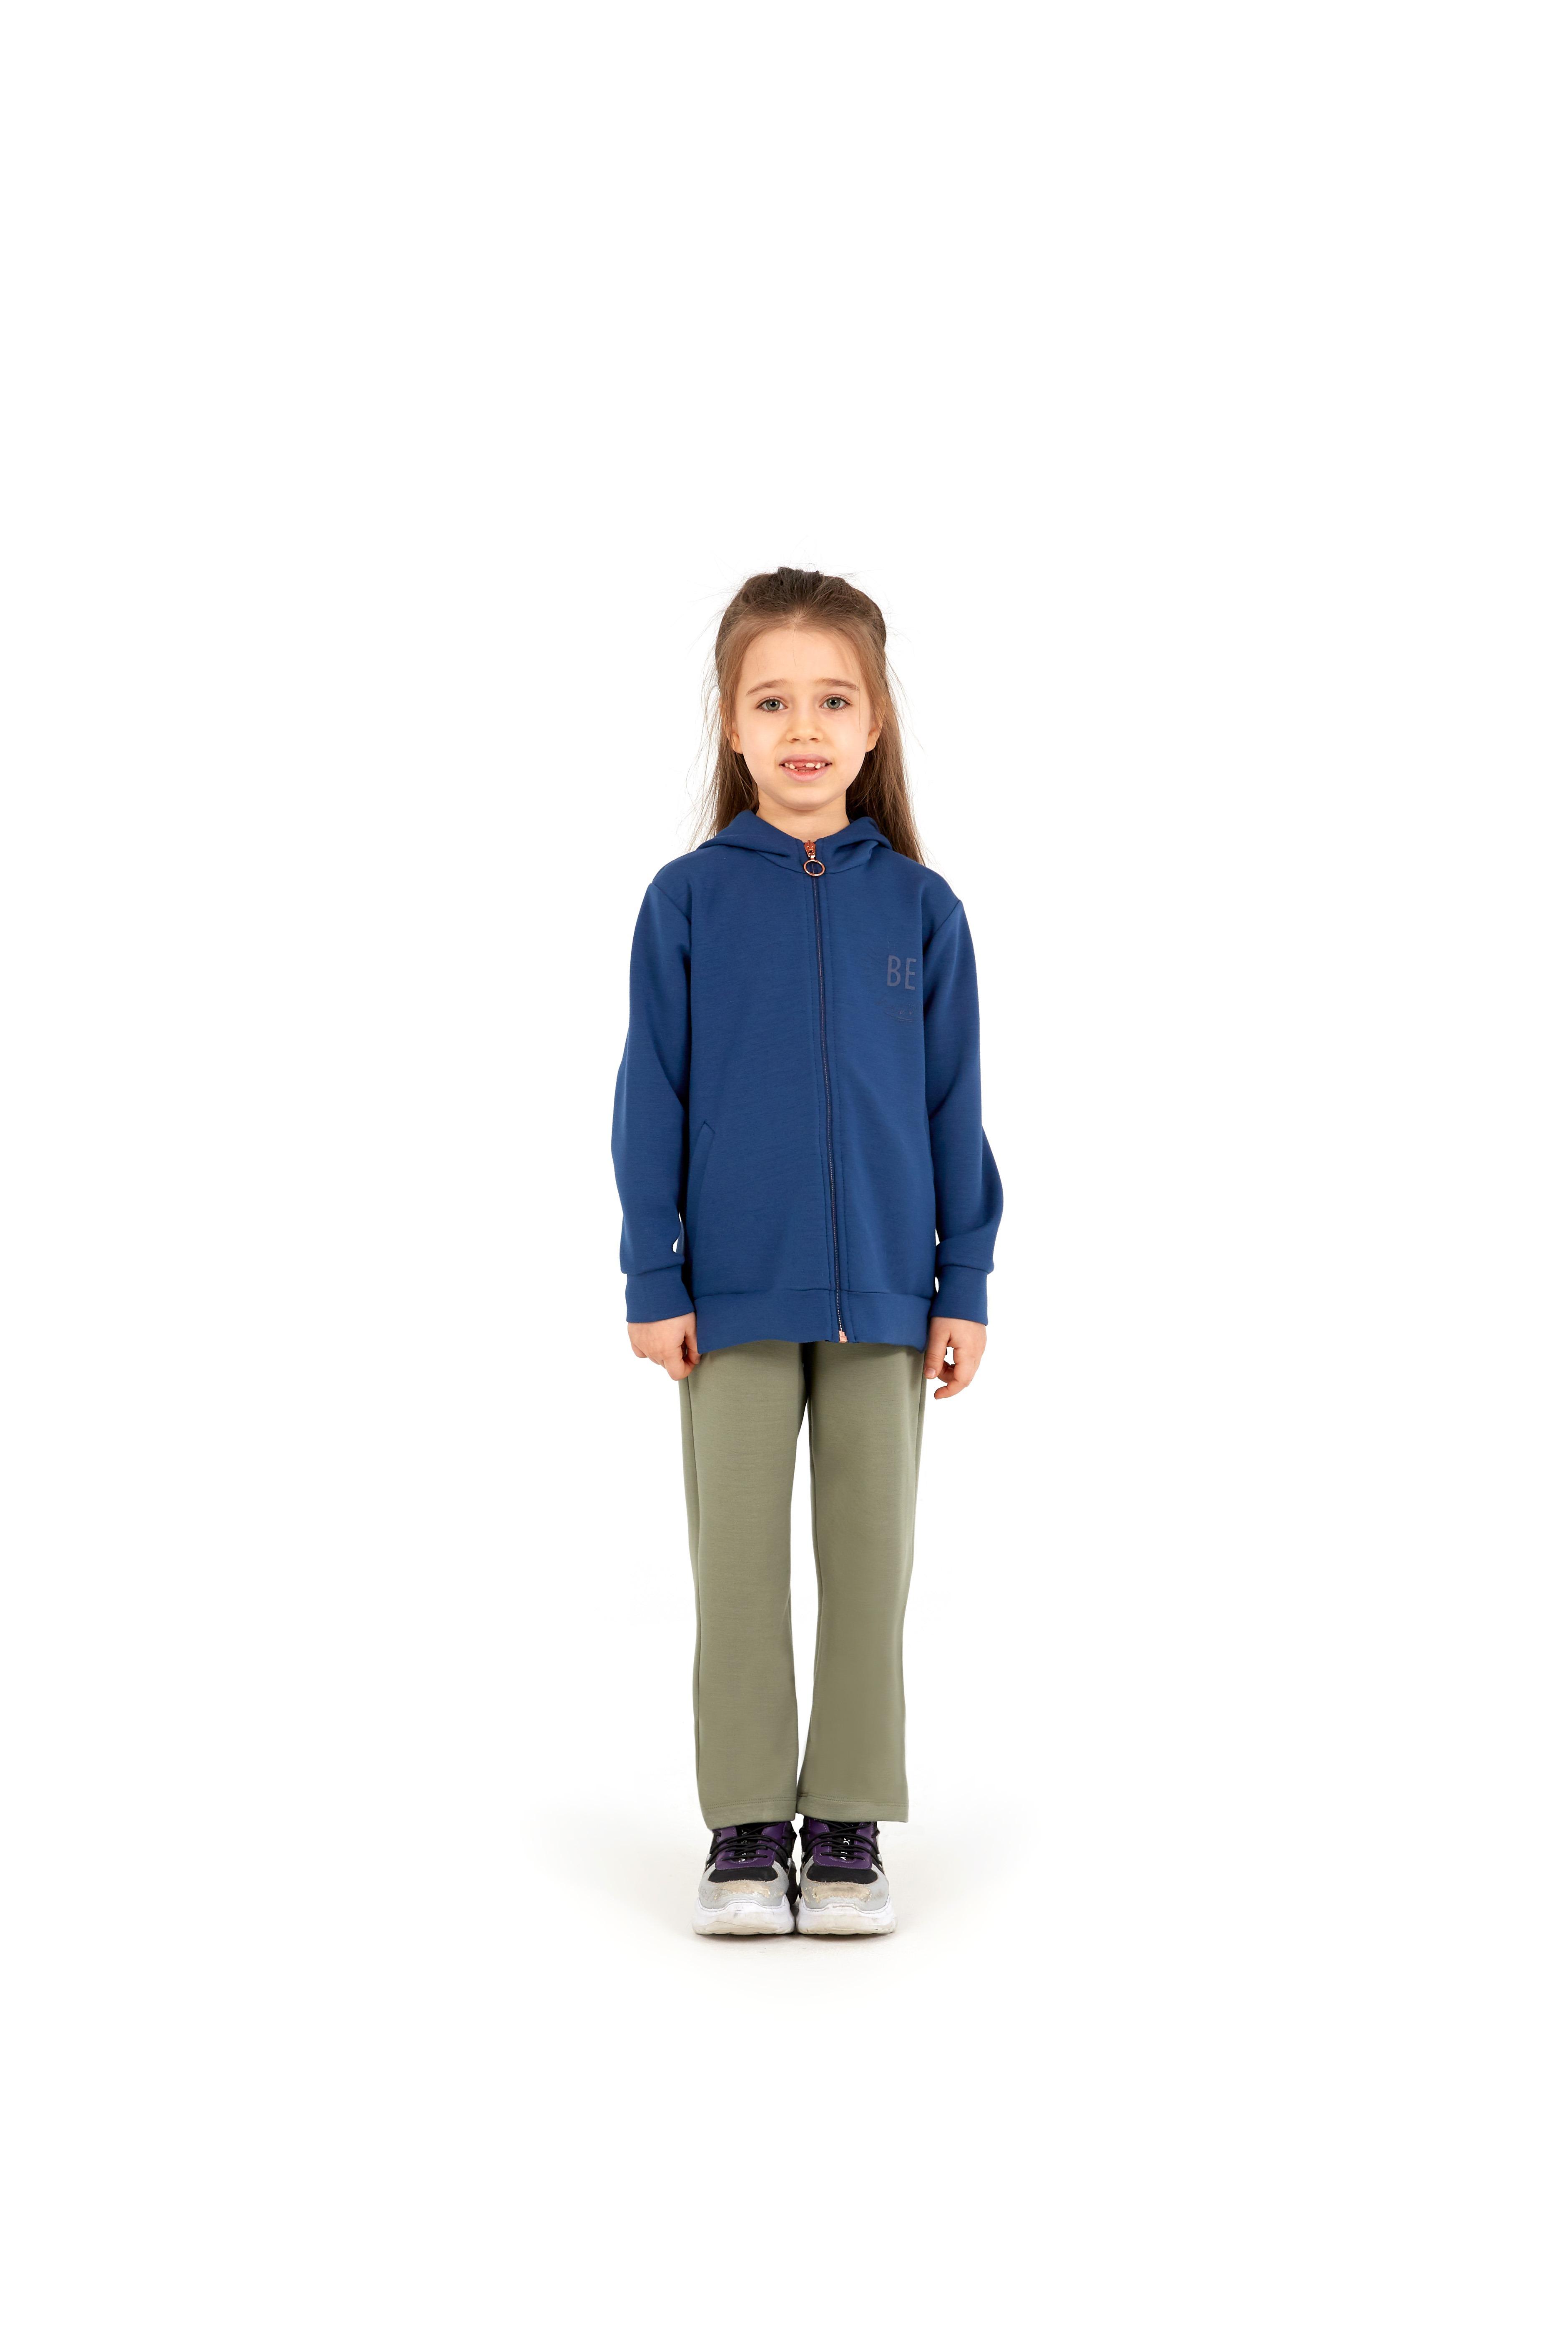 Kız Çocuk Fermuarlı Kapşonlu Sweatshirt 60052 - Lacivert - Thumbnail